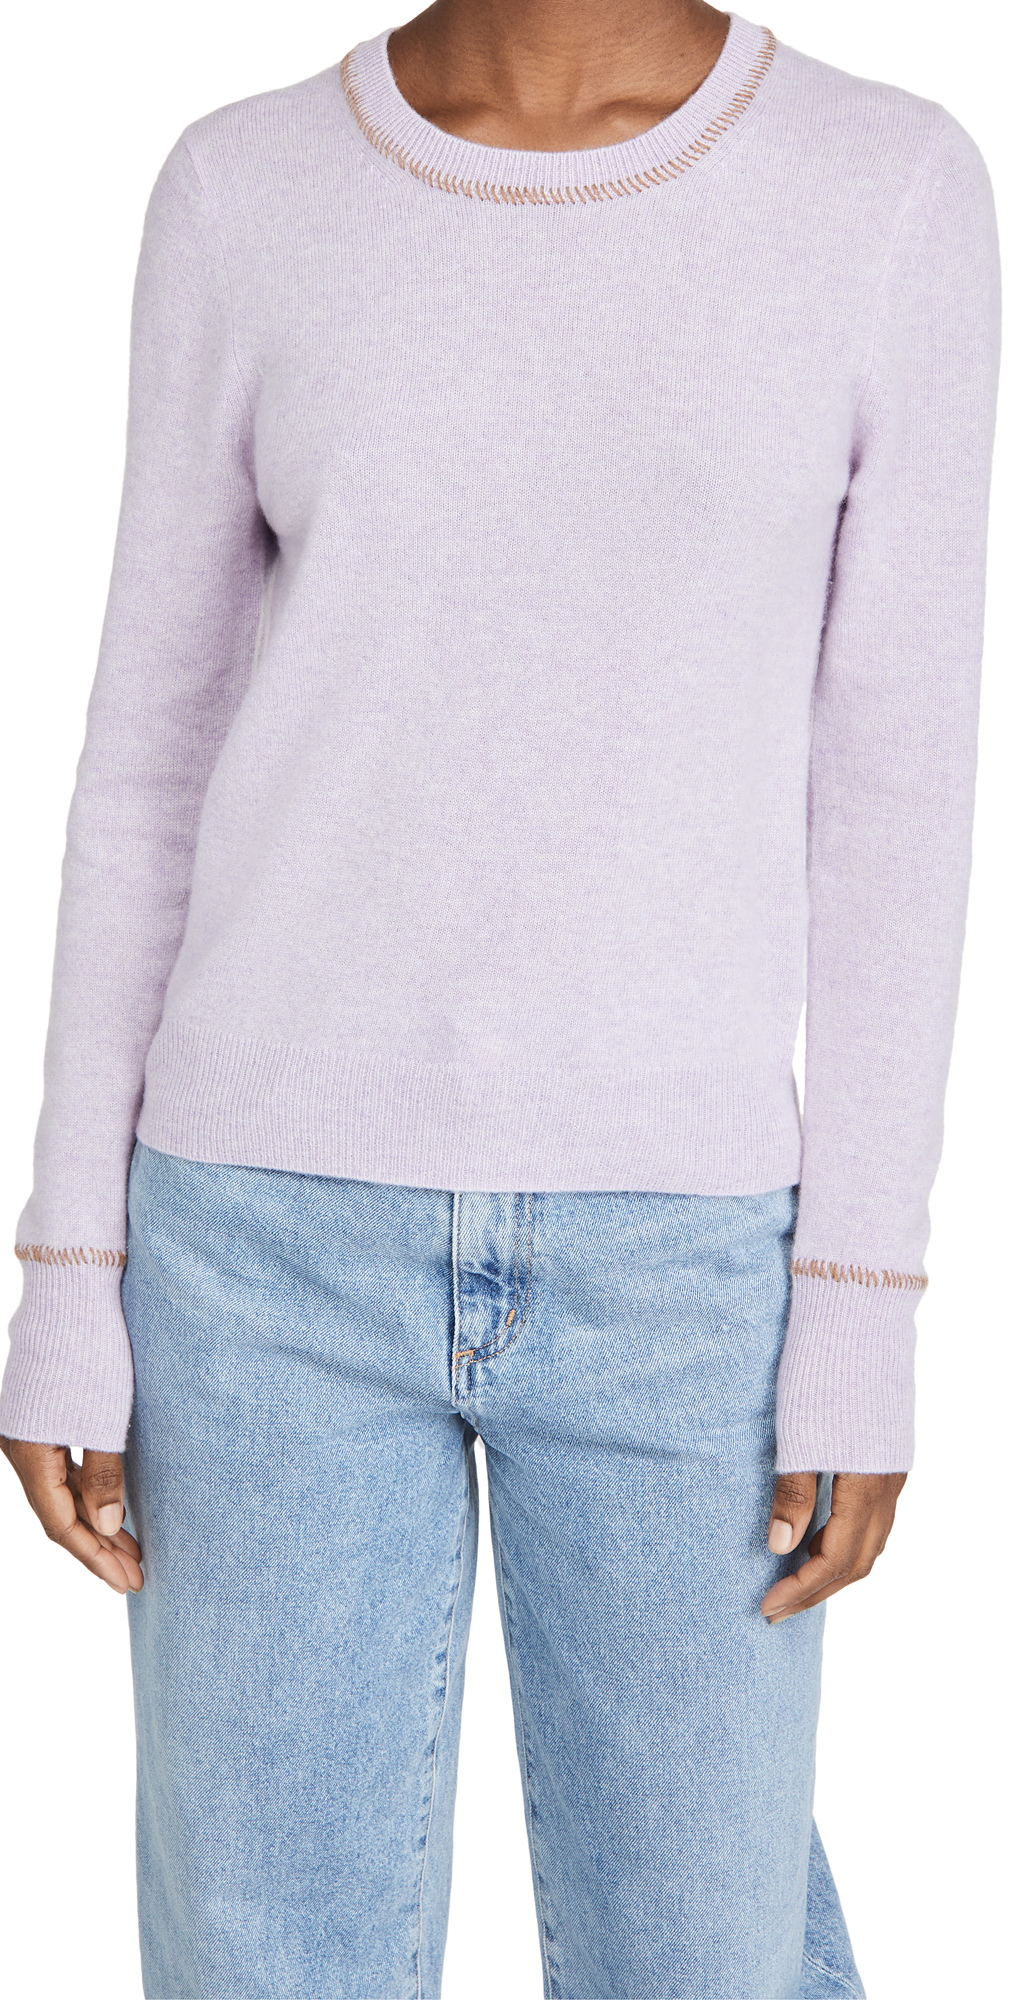 Veronica Beard Zalga Cashmere Sweater